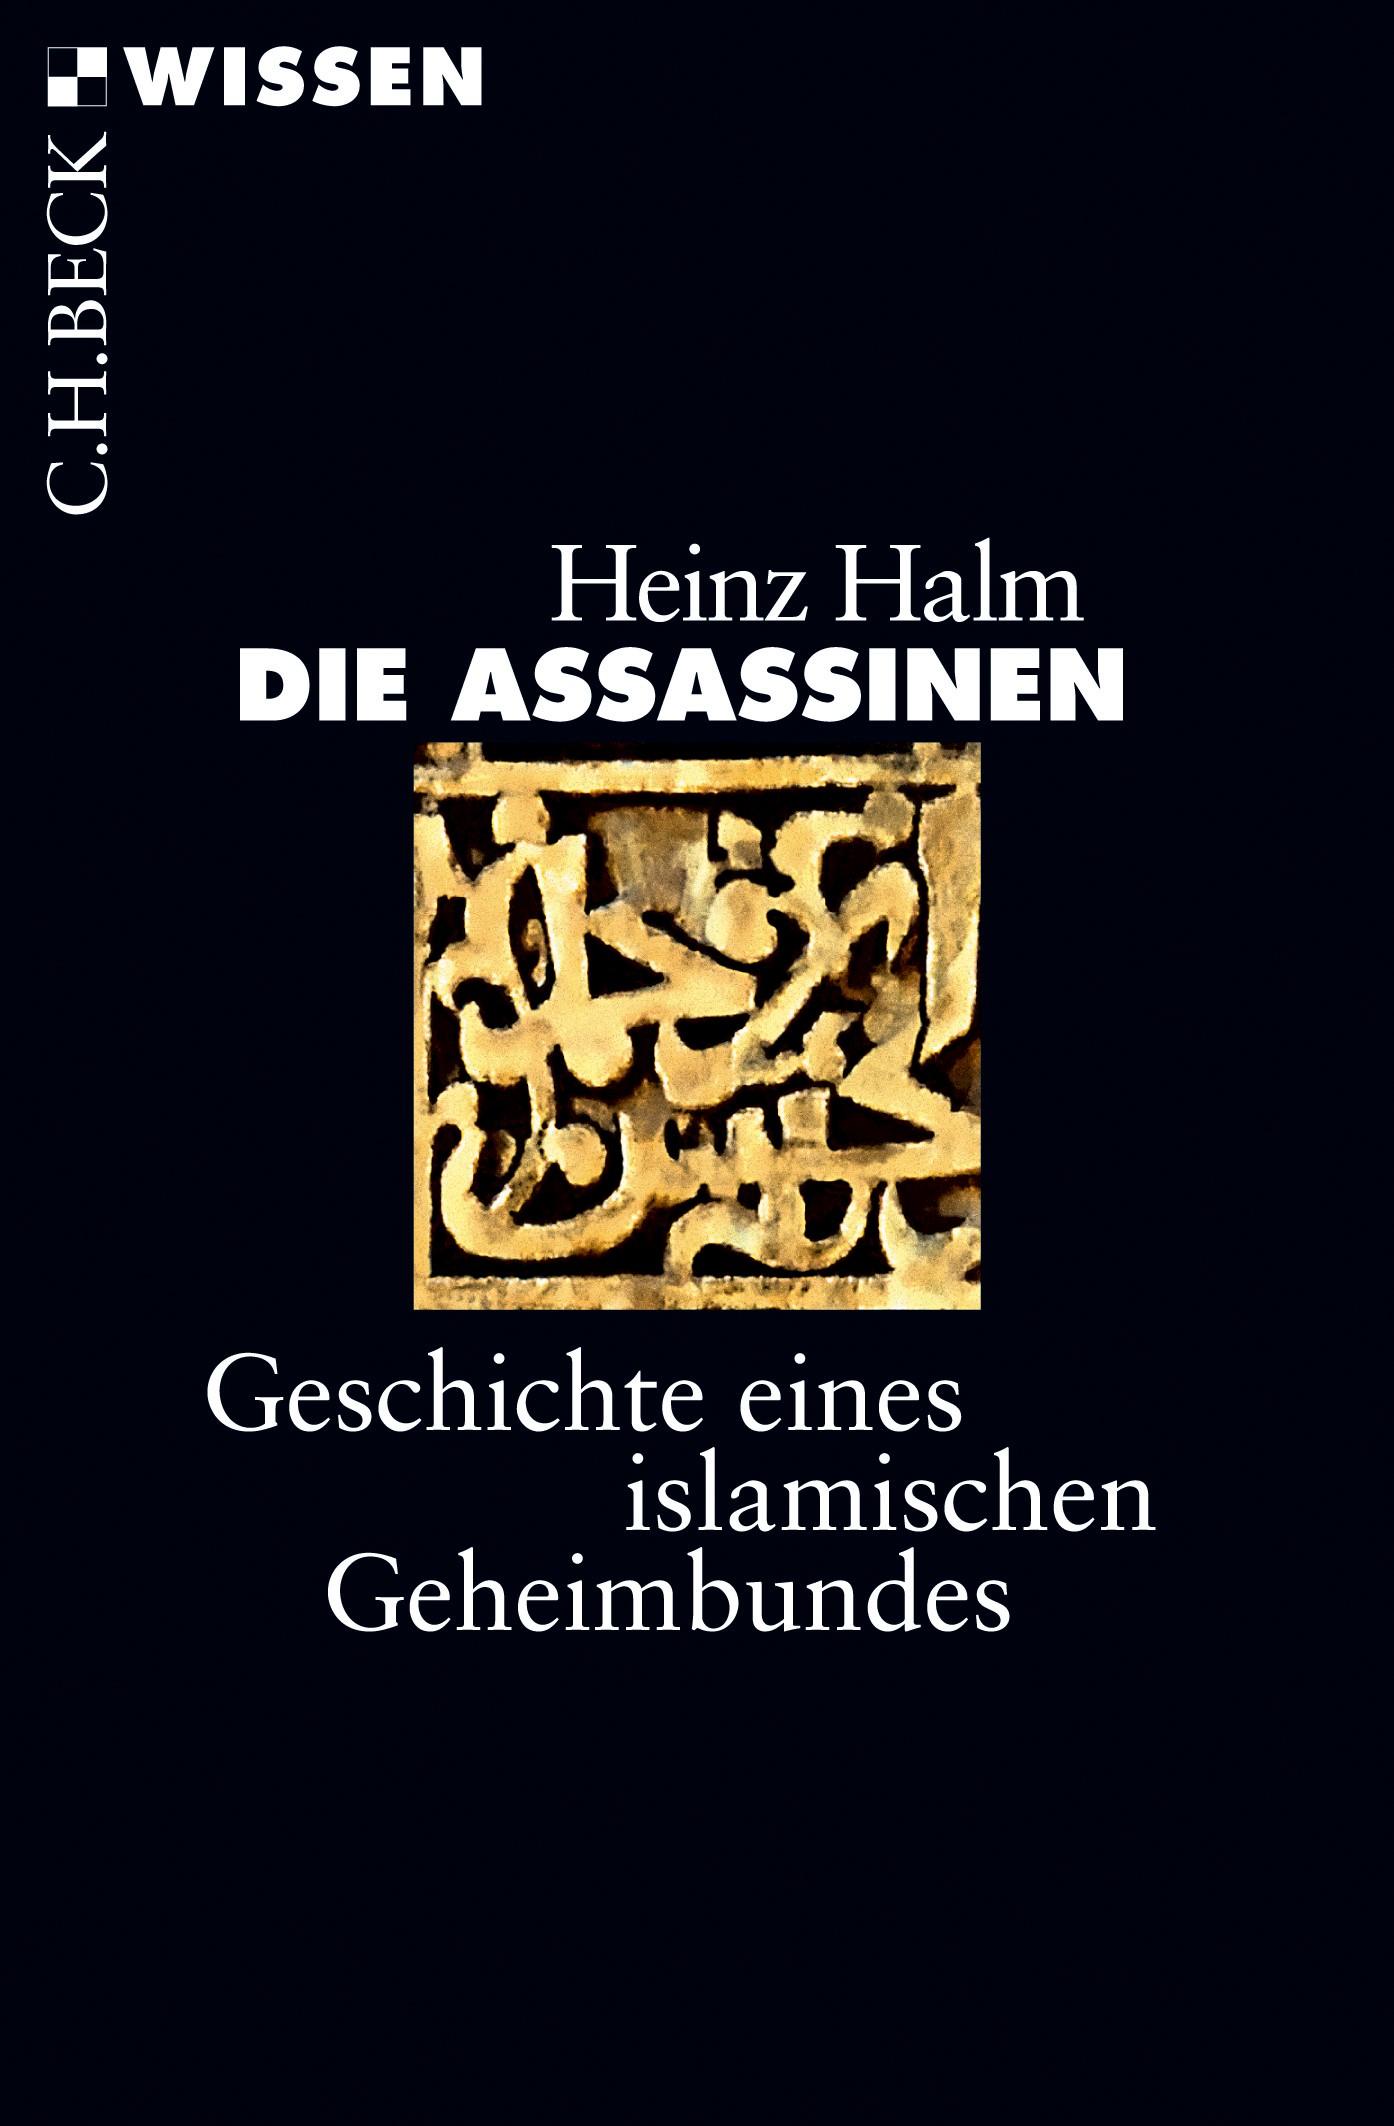 Cover des Buches 'Die Assassinen'